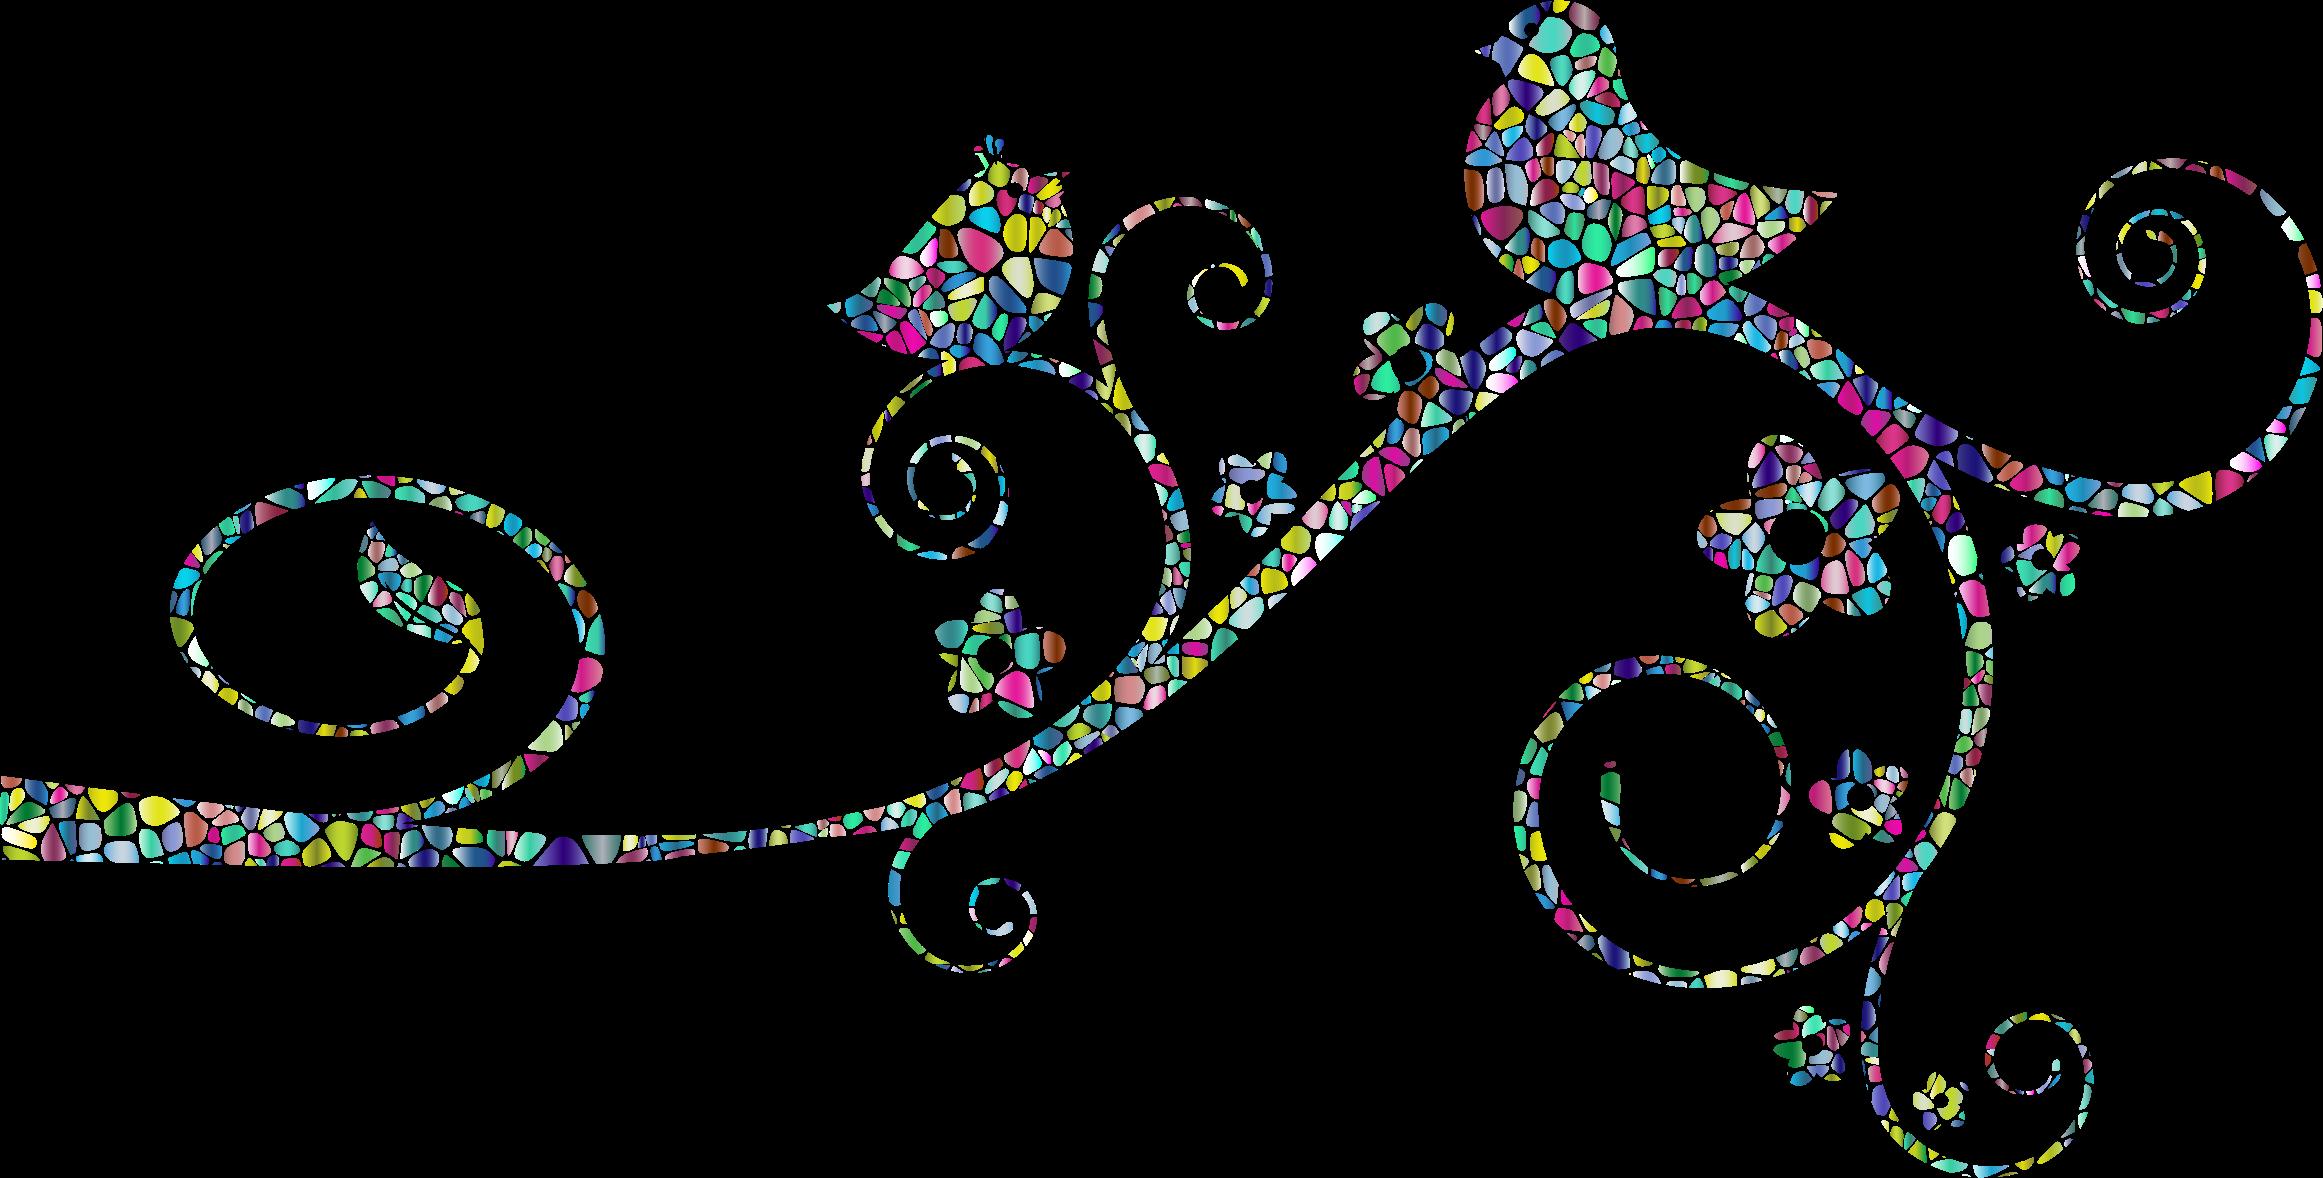 Polyprismatic tiles birds no. Flourish clipart file